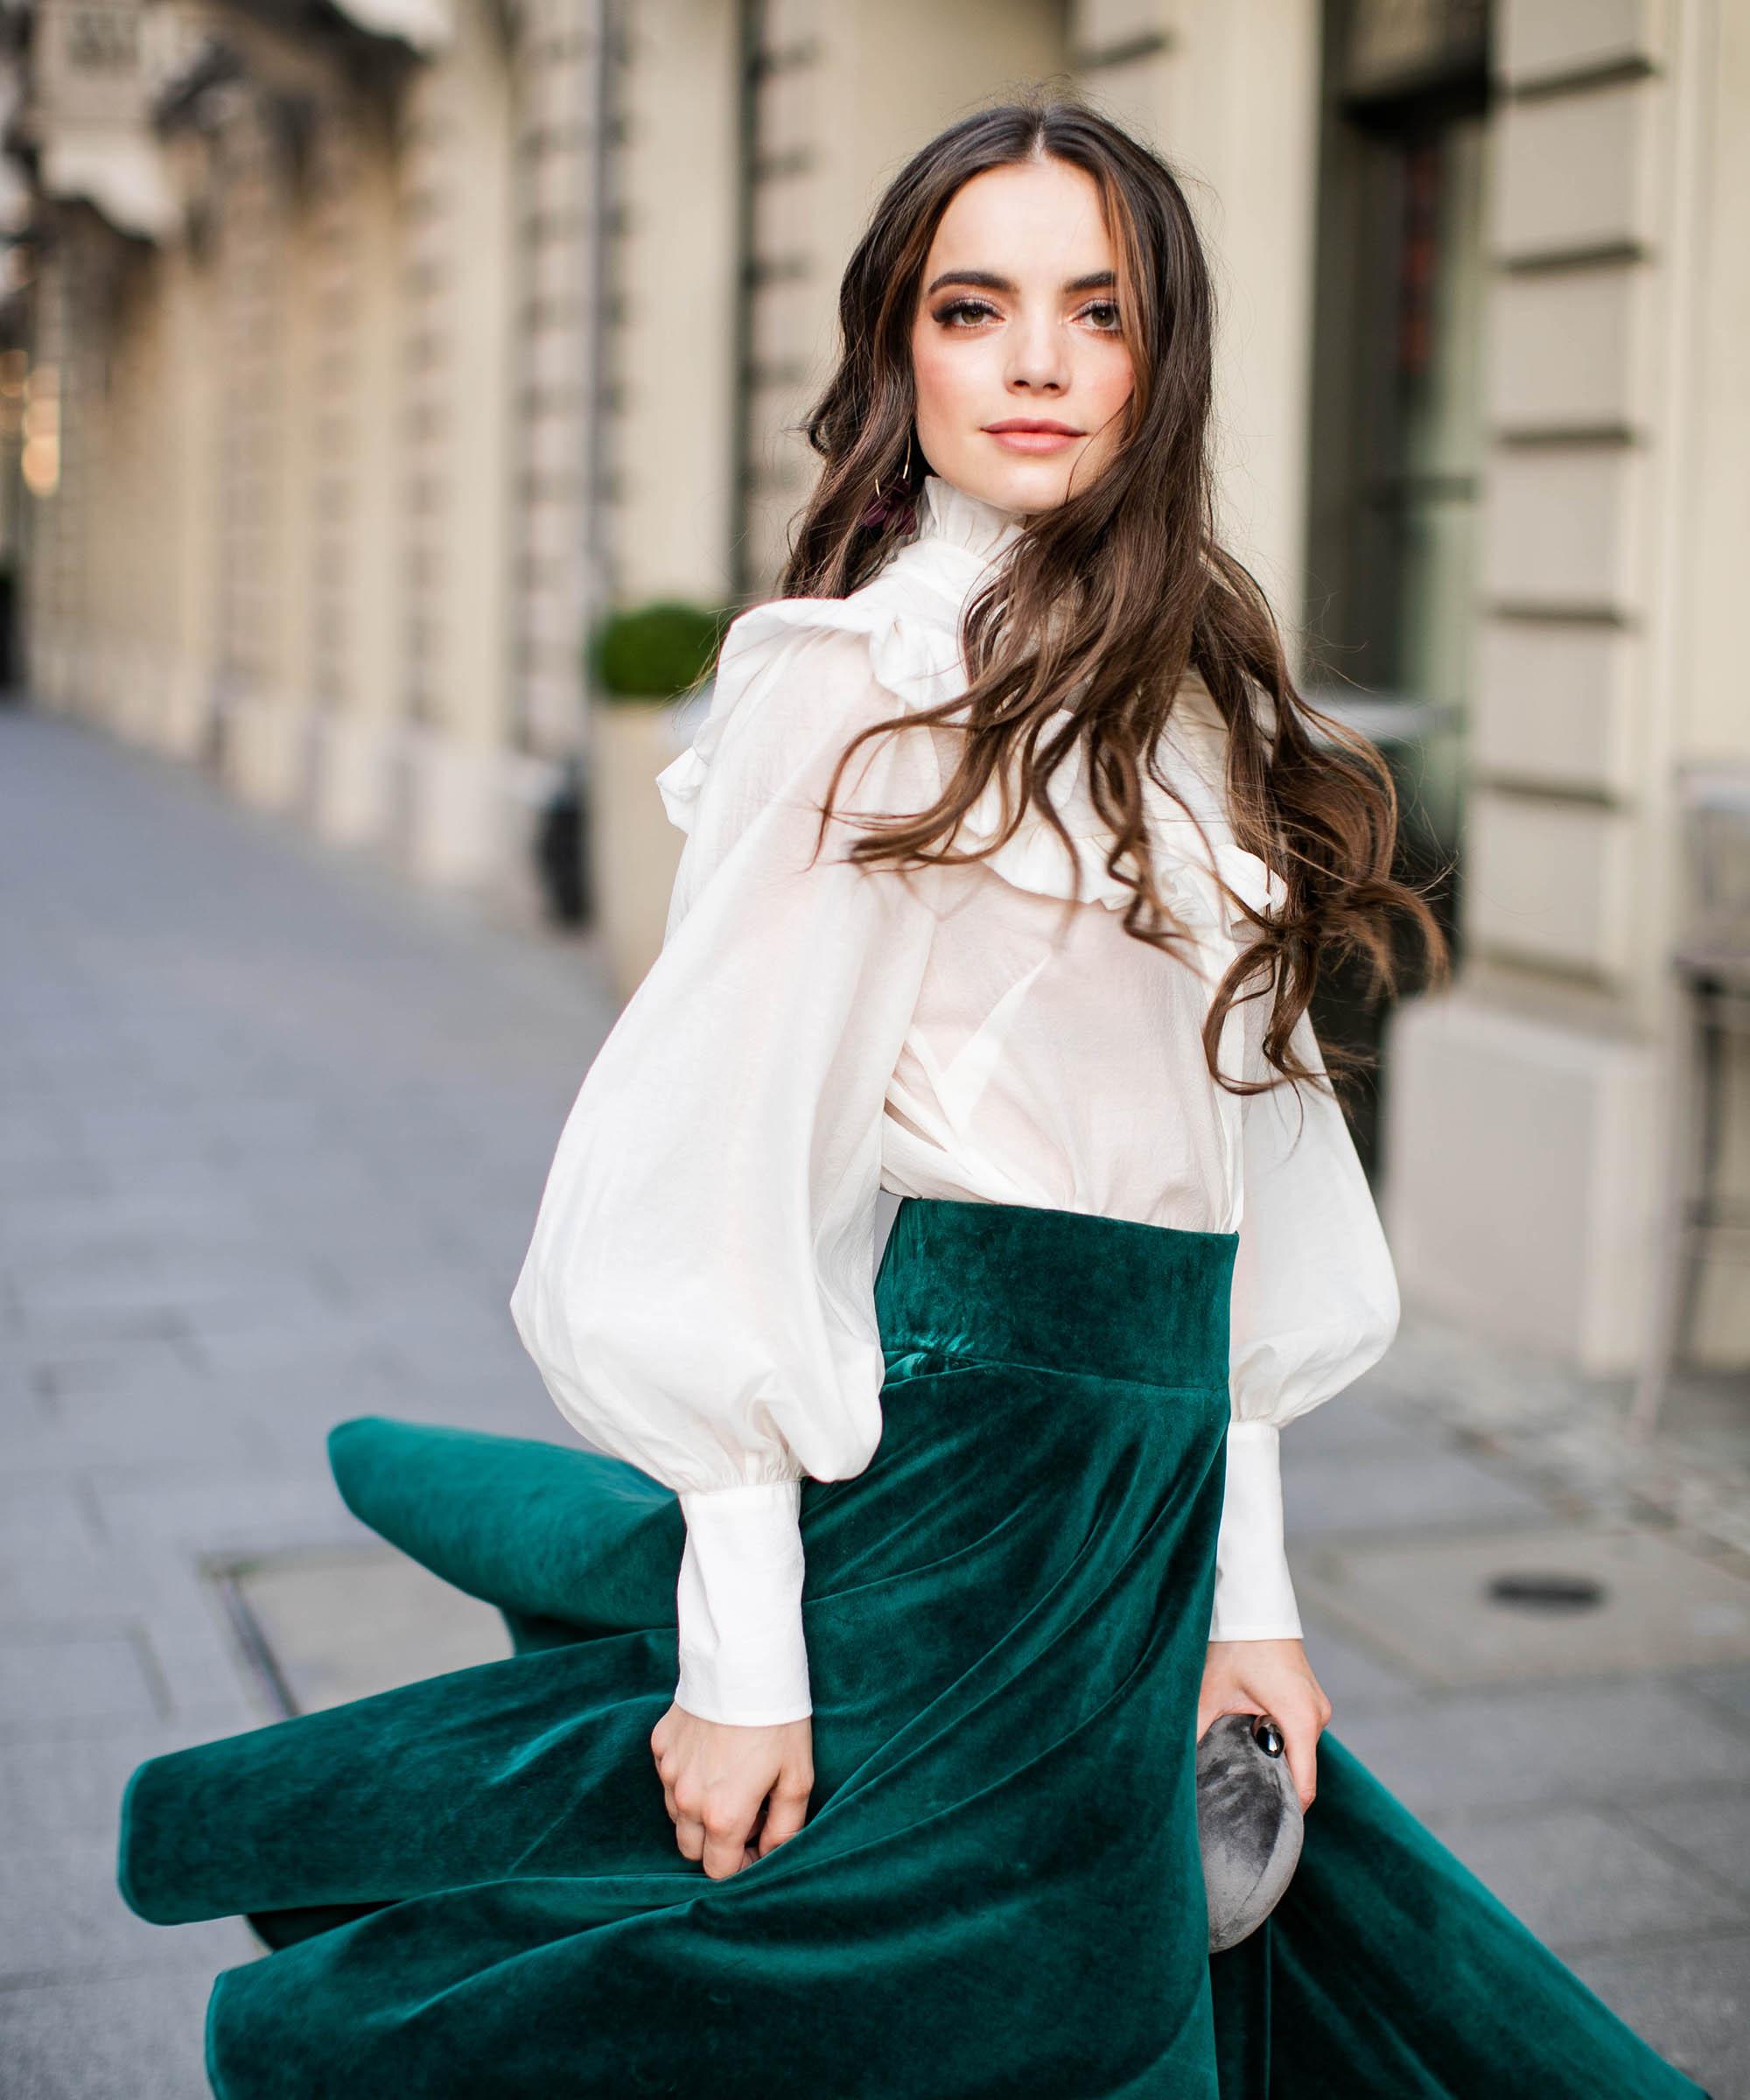 zielona spódnica aksamitna